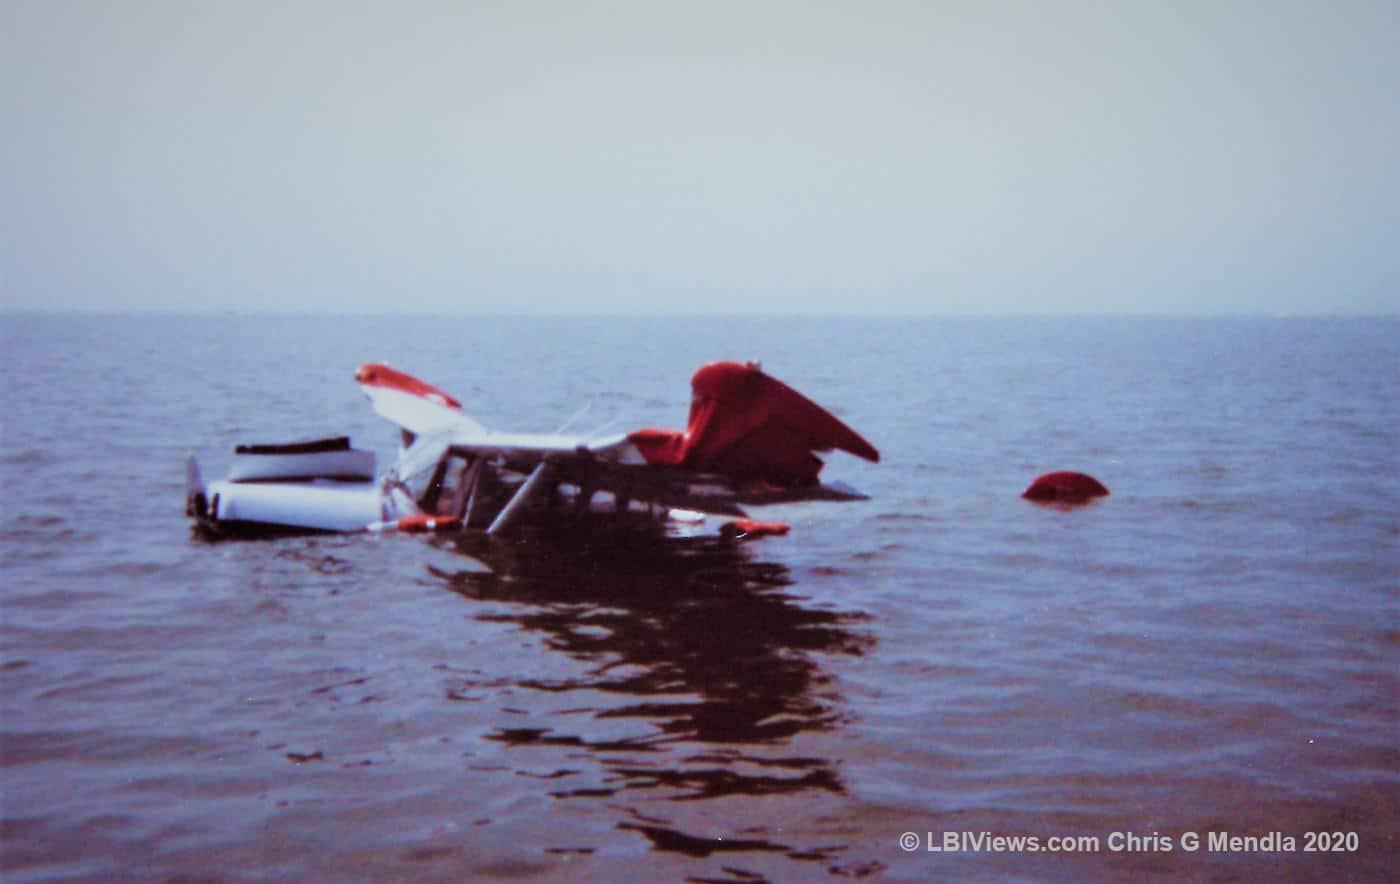 Banner plane crash off Long Beach Island 1970s